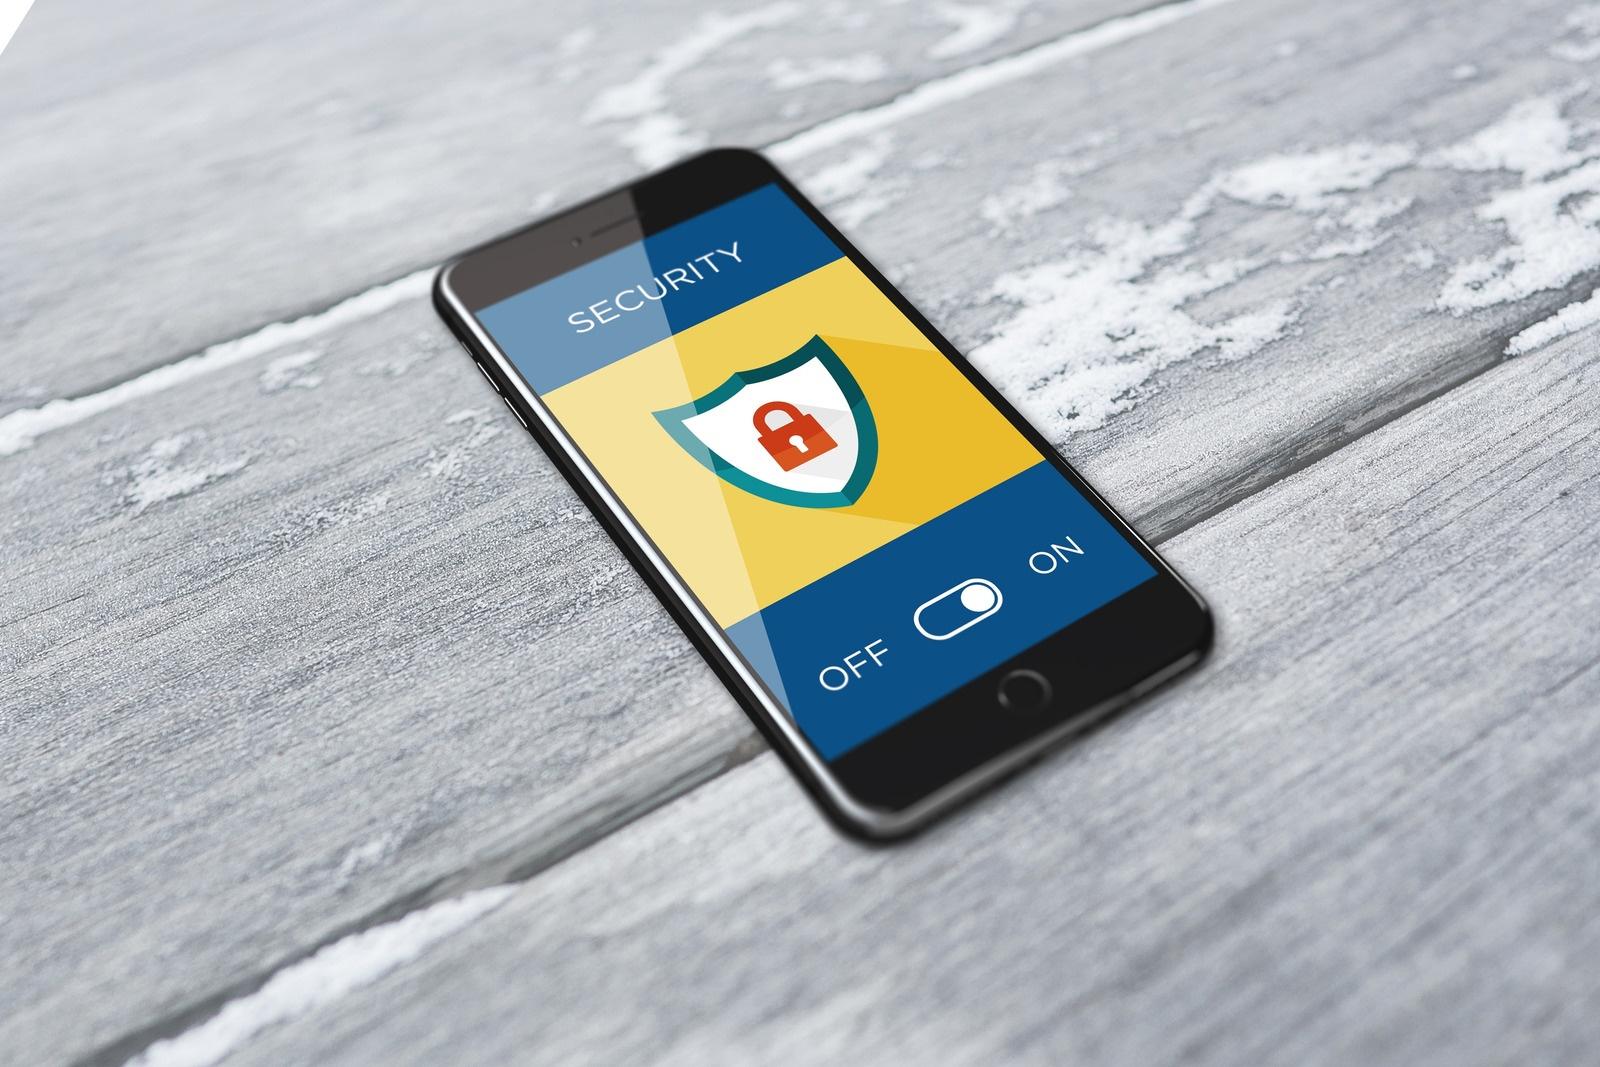 Foto von BiljaST--2868488: https://www.canva.com/photos/MADQ5O6pNv4-smartphone-showing-activated-security-system/